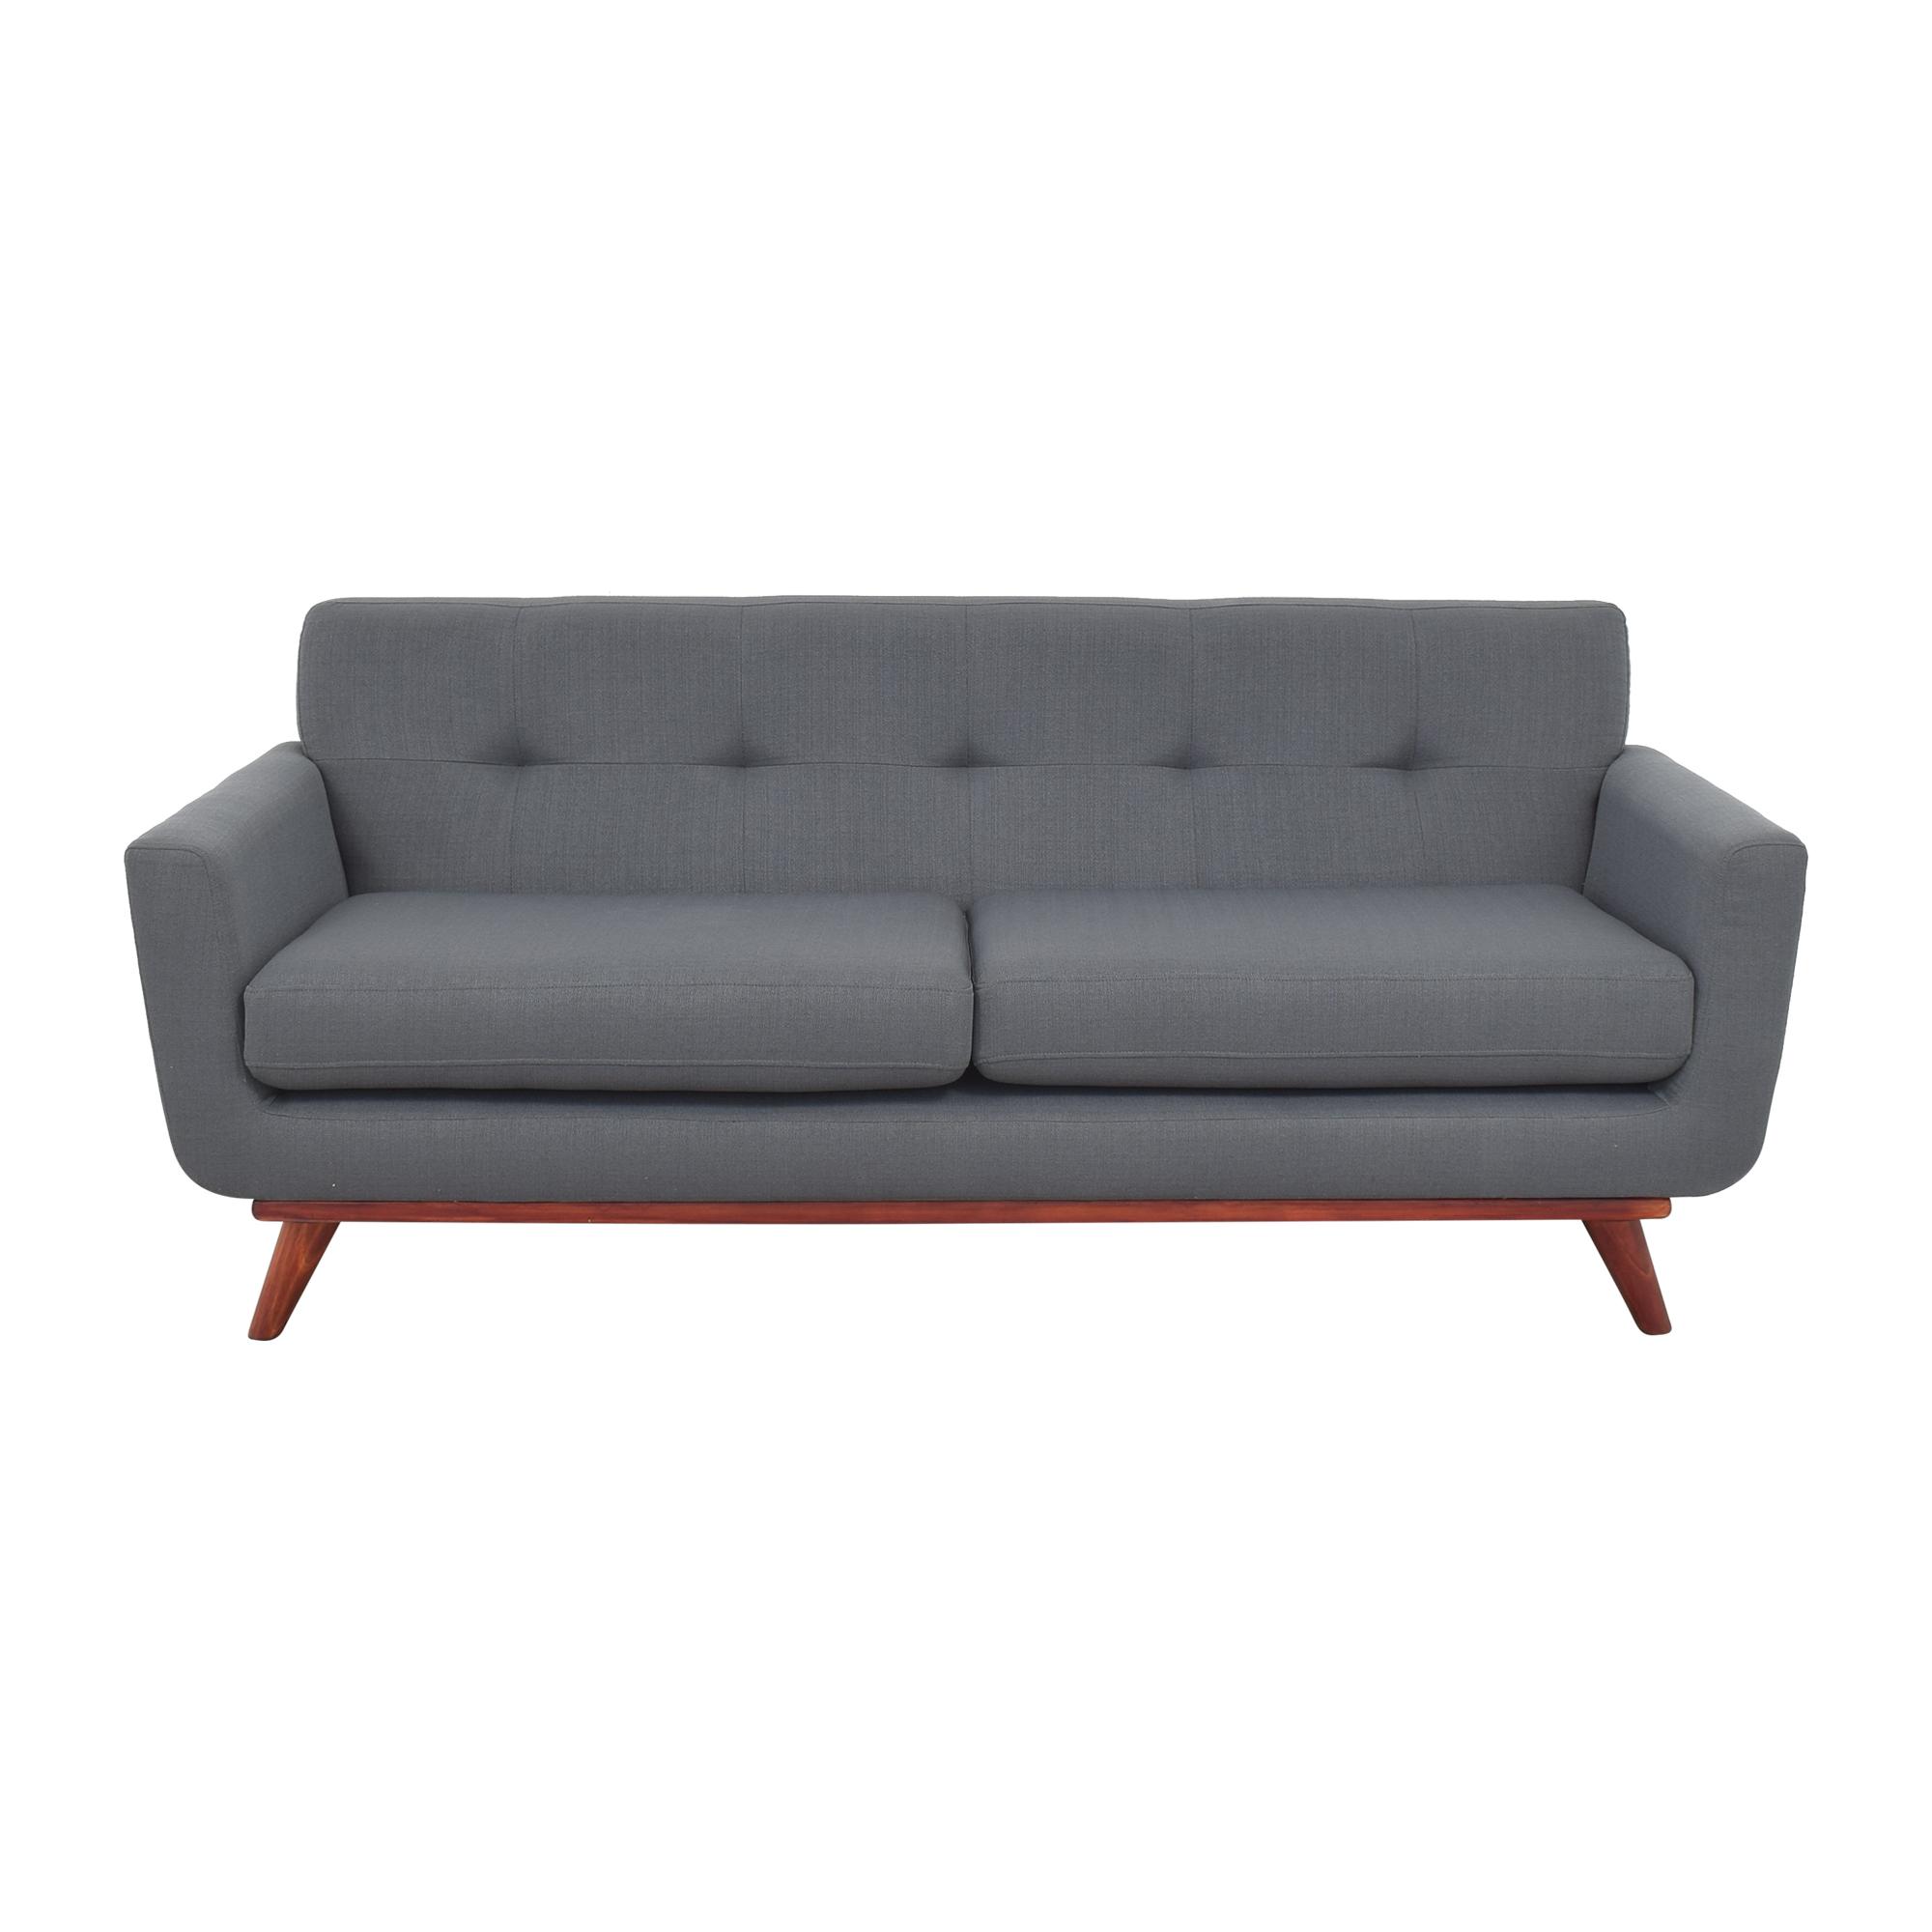 Mid-Century Modern Style Sofa Classic Sofas